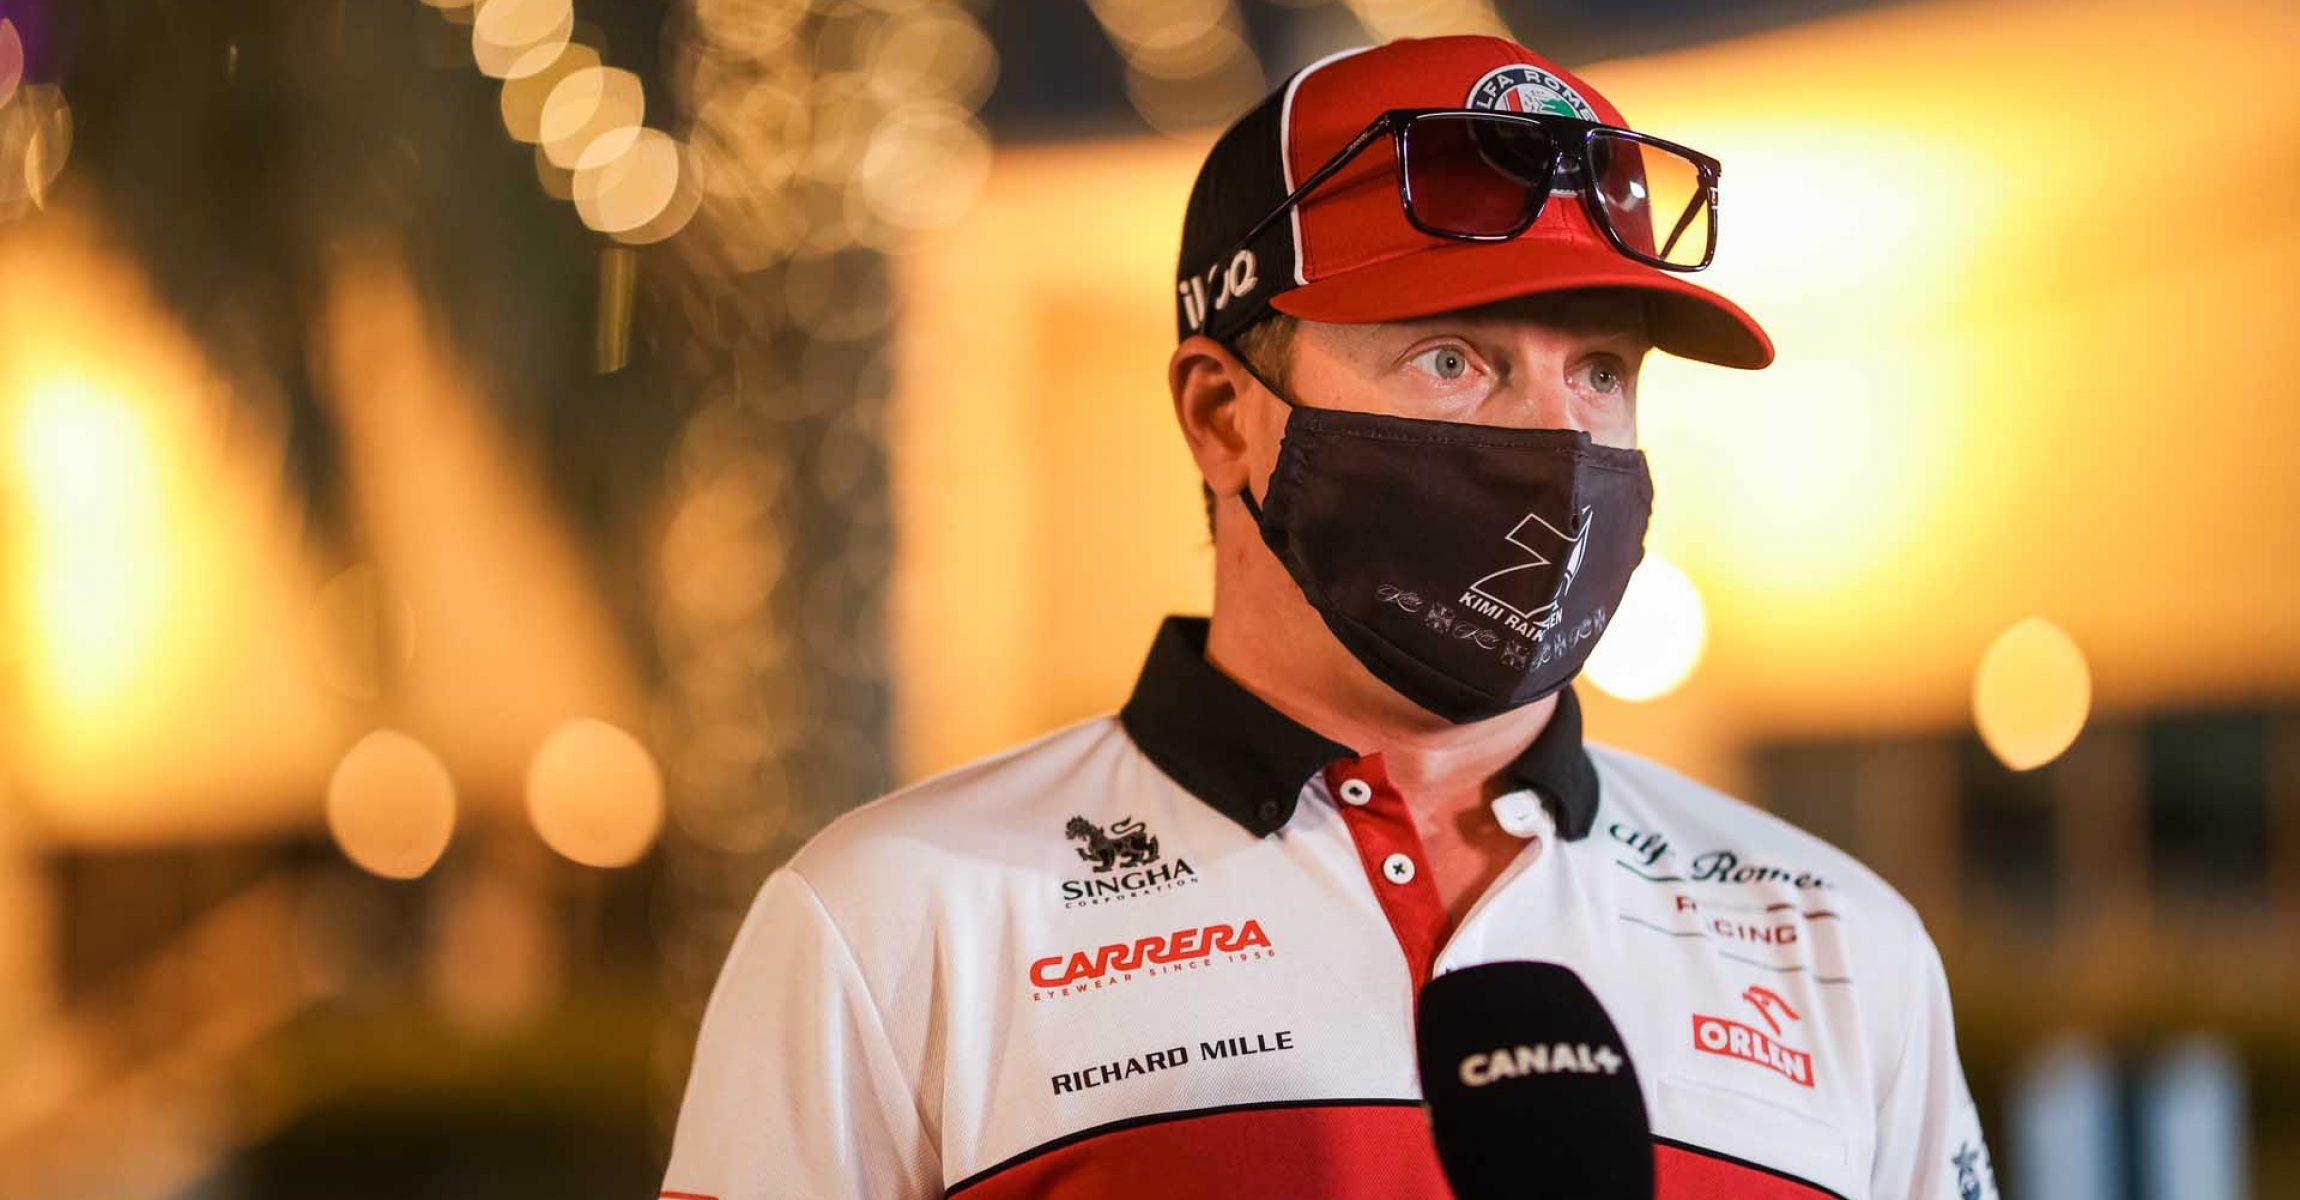 RAIKKONEN Kimi Räikkönen (fin), Alfa Romeo Racing ORLEN C39, portrait during the Formula 1 Rolex Sakhir Grand Prix 2020, from December 4 to 6, 2020 on the Bahrain International Circuit, in Sakhir, Bahrain - Photo Antonin Vincent / DPPI